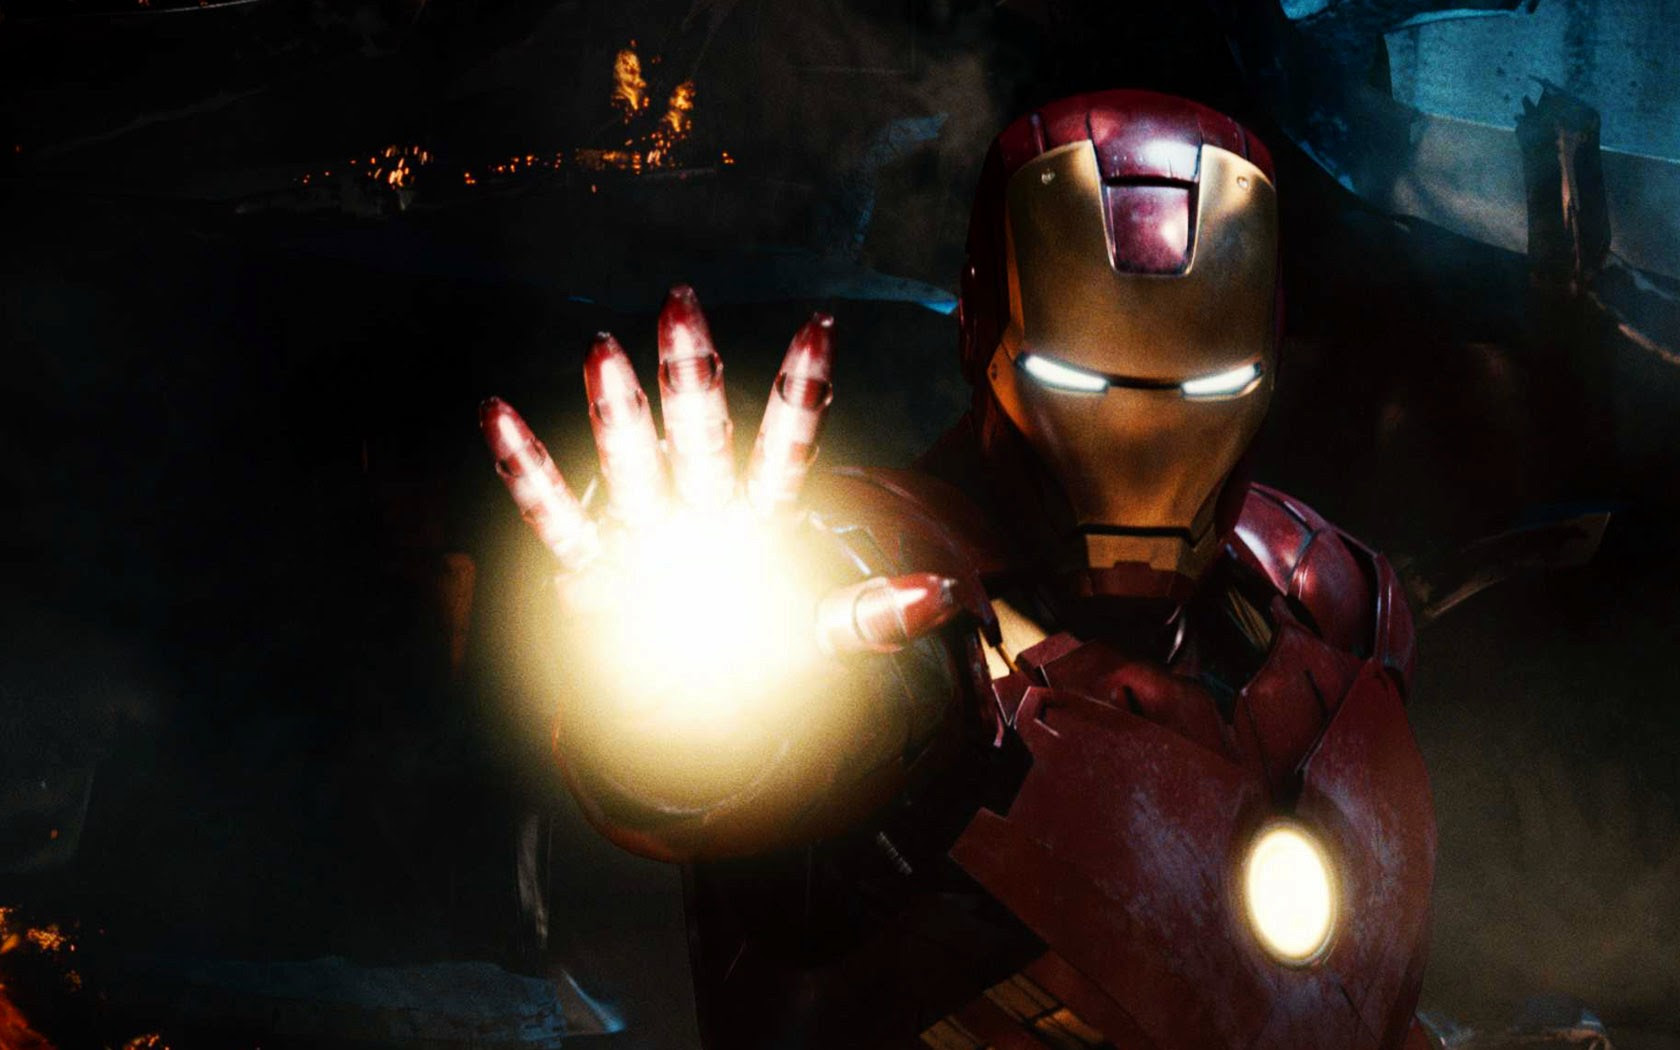 Iron Man Iron Man 3 Wallpaper 31868061 Fanpop